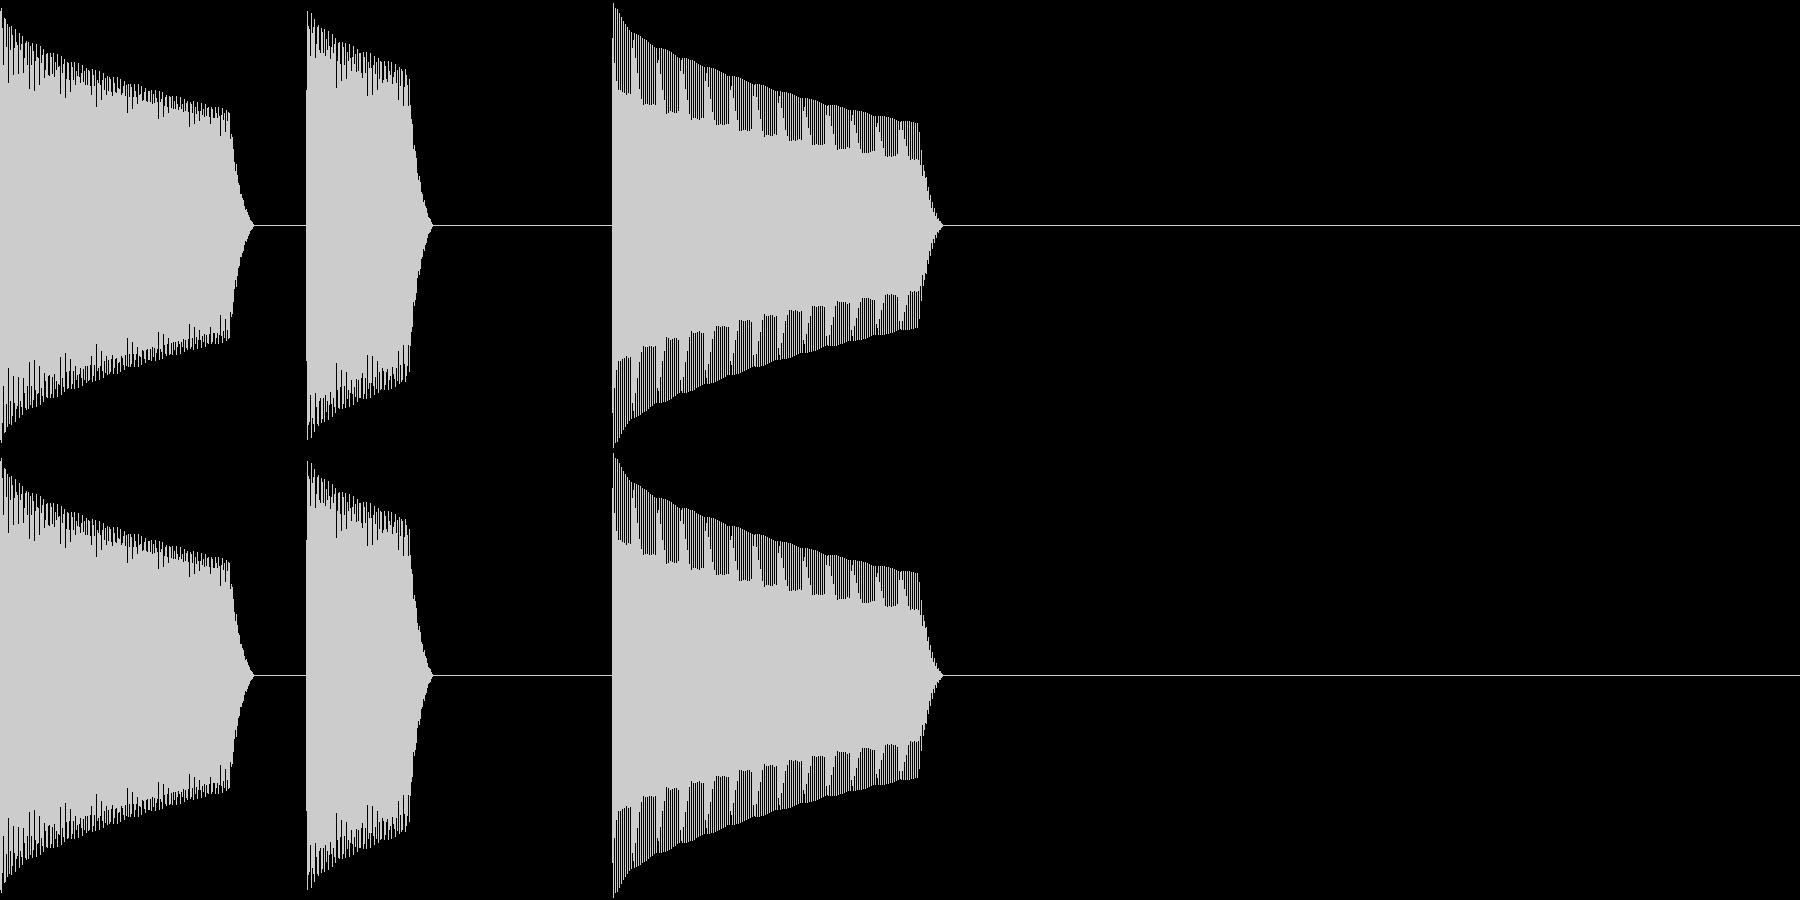 ATM 操作音 5の未再生の波形